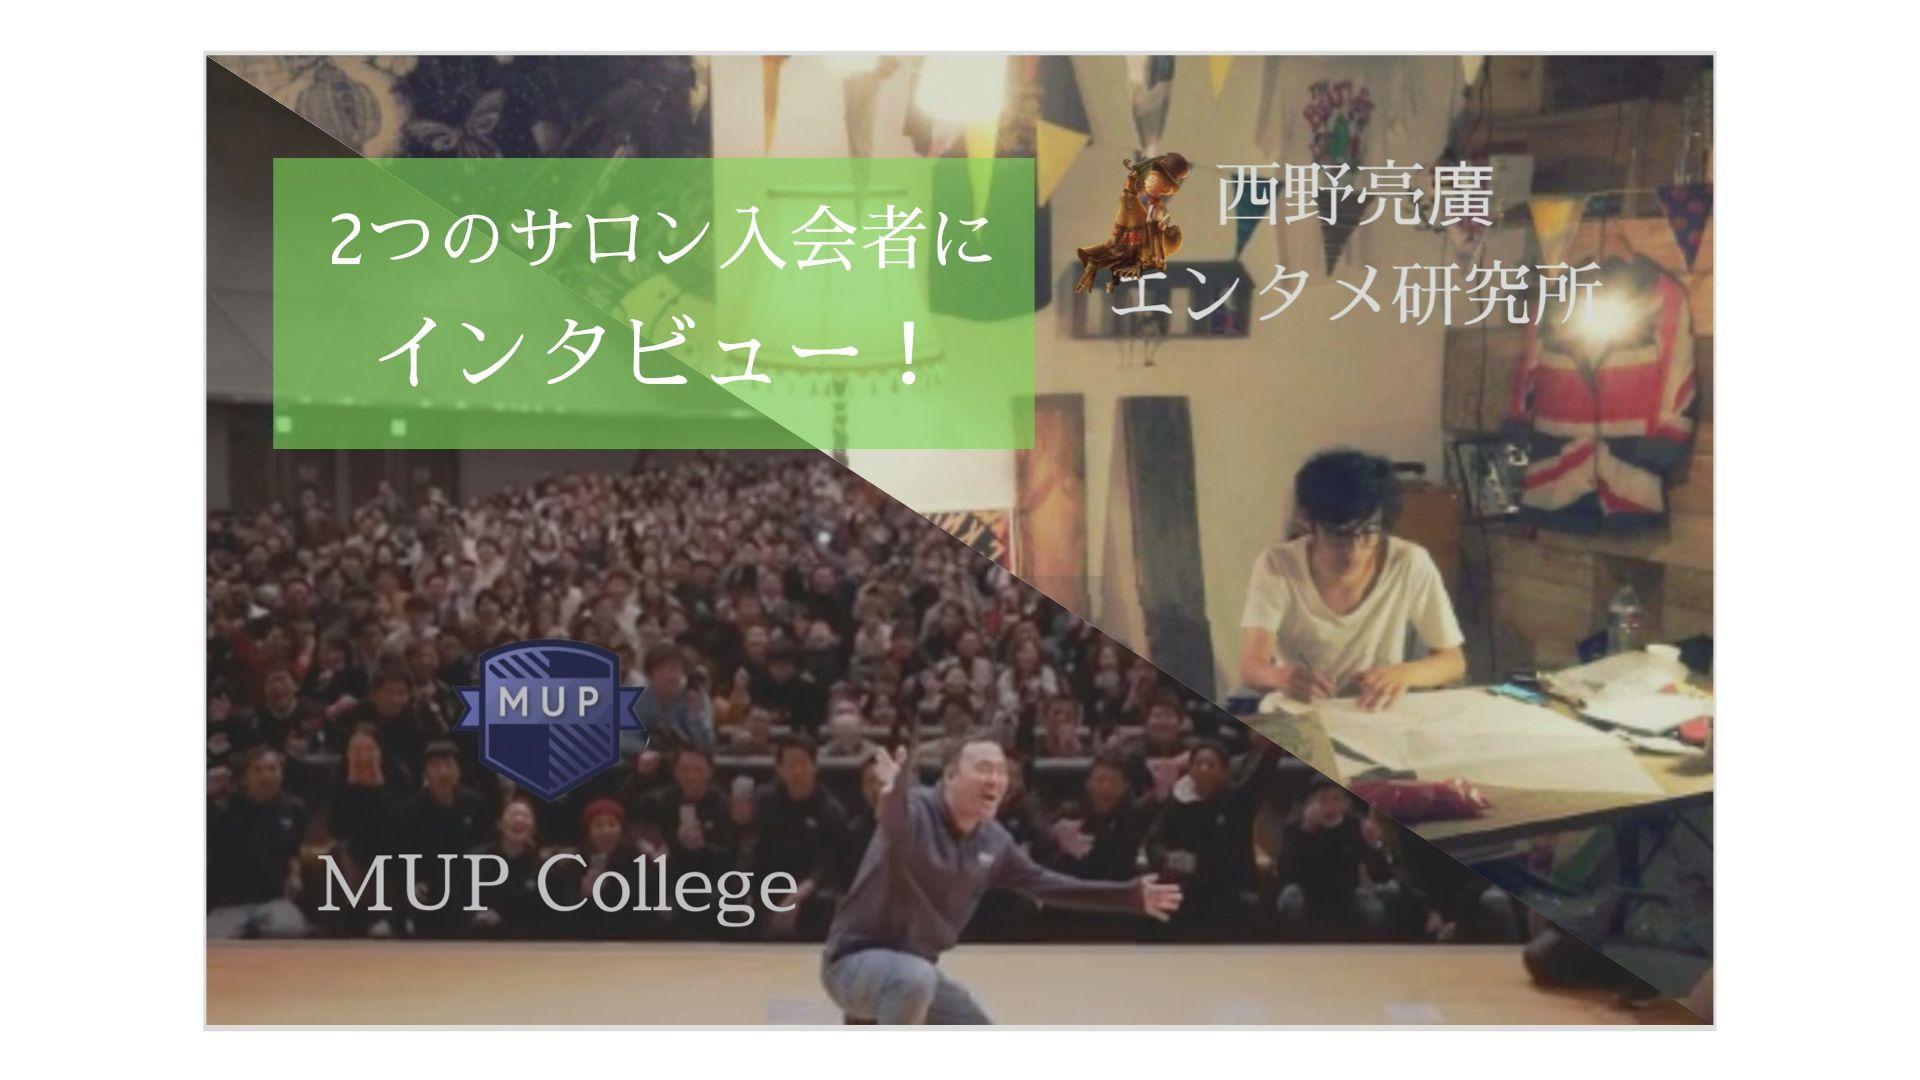 MUPカレッジ・西野亮廣エンタメ研究所 2つの入会者にインタビュー!